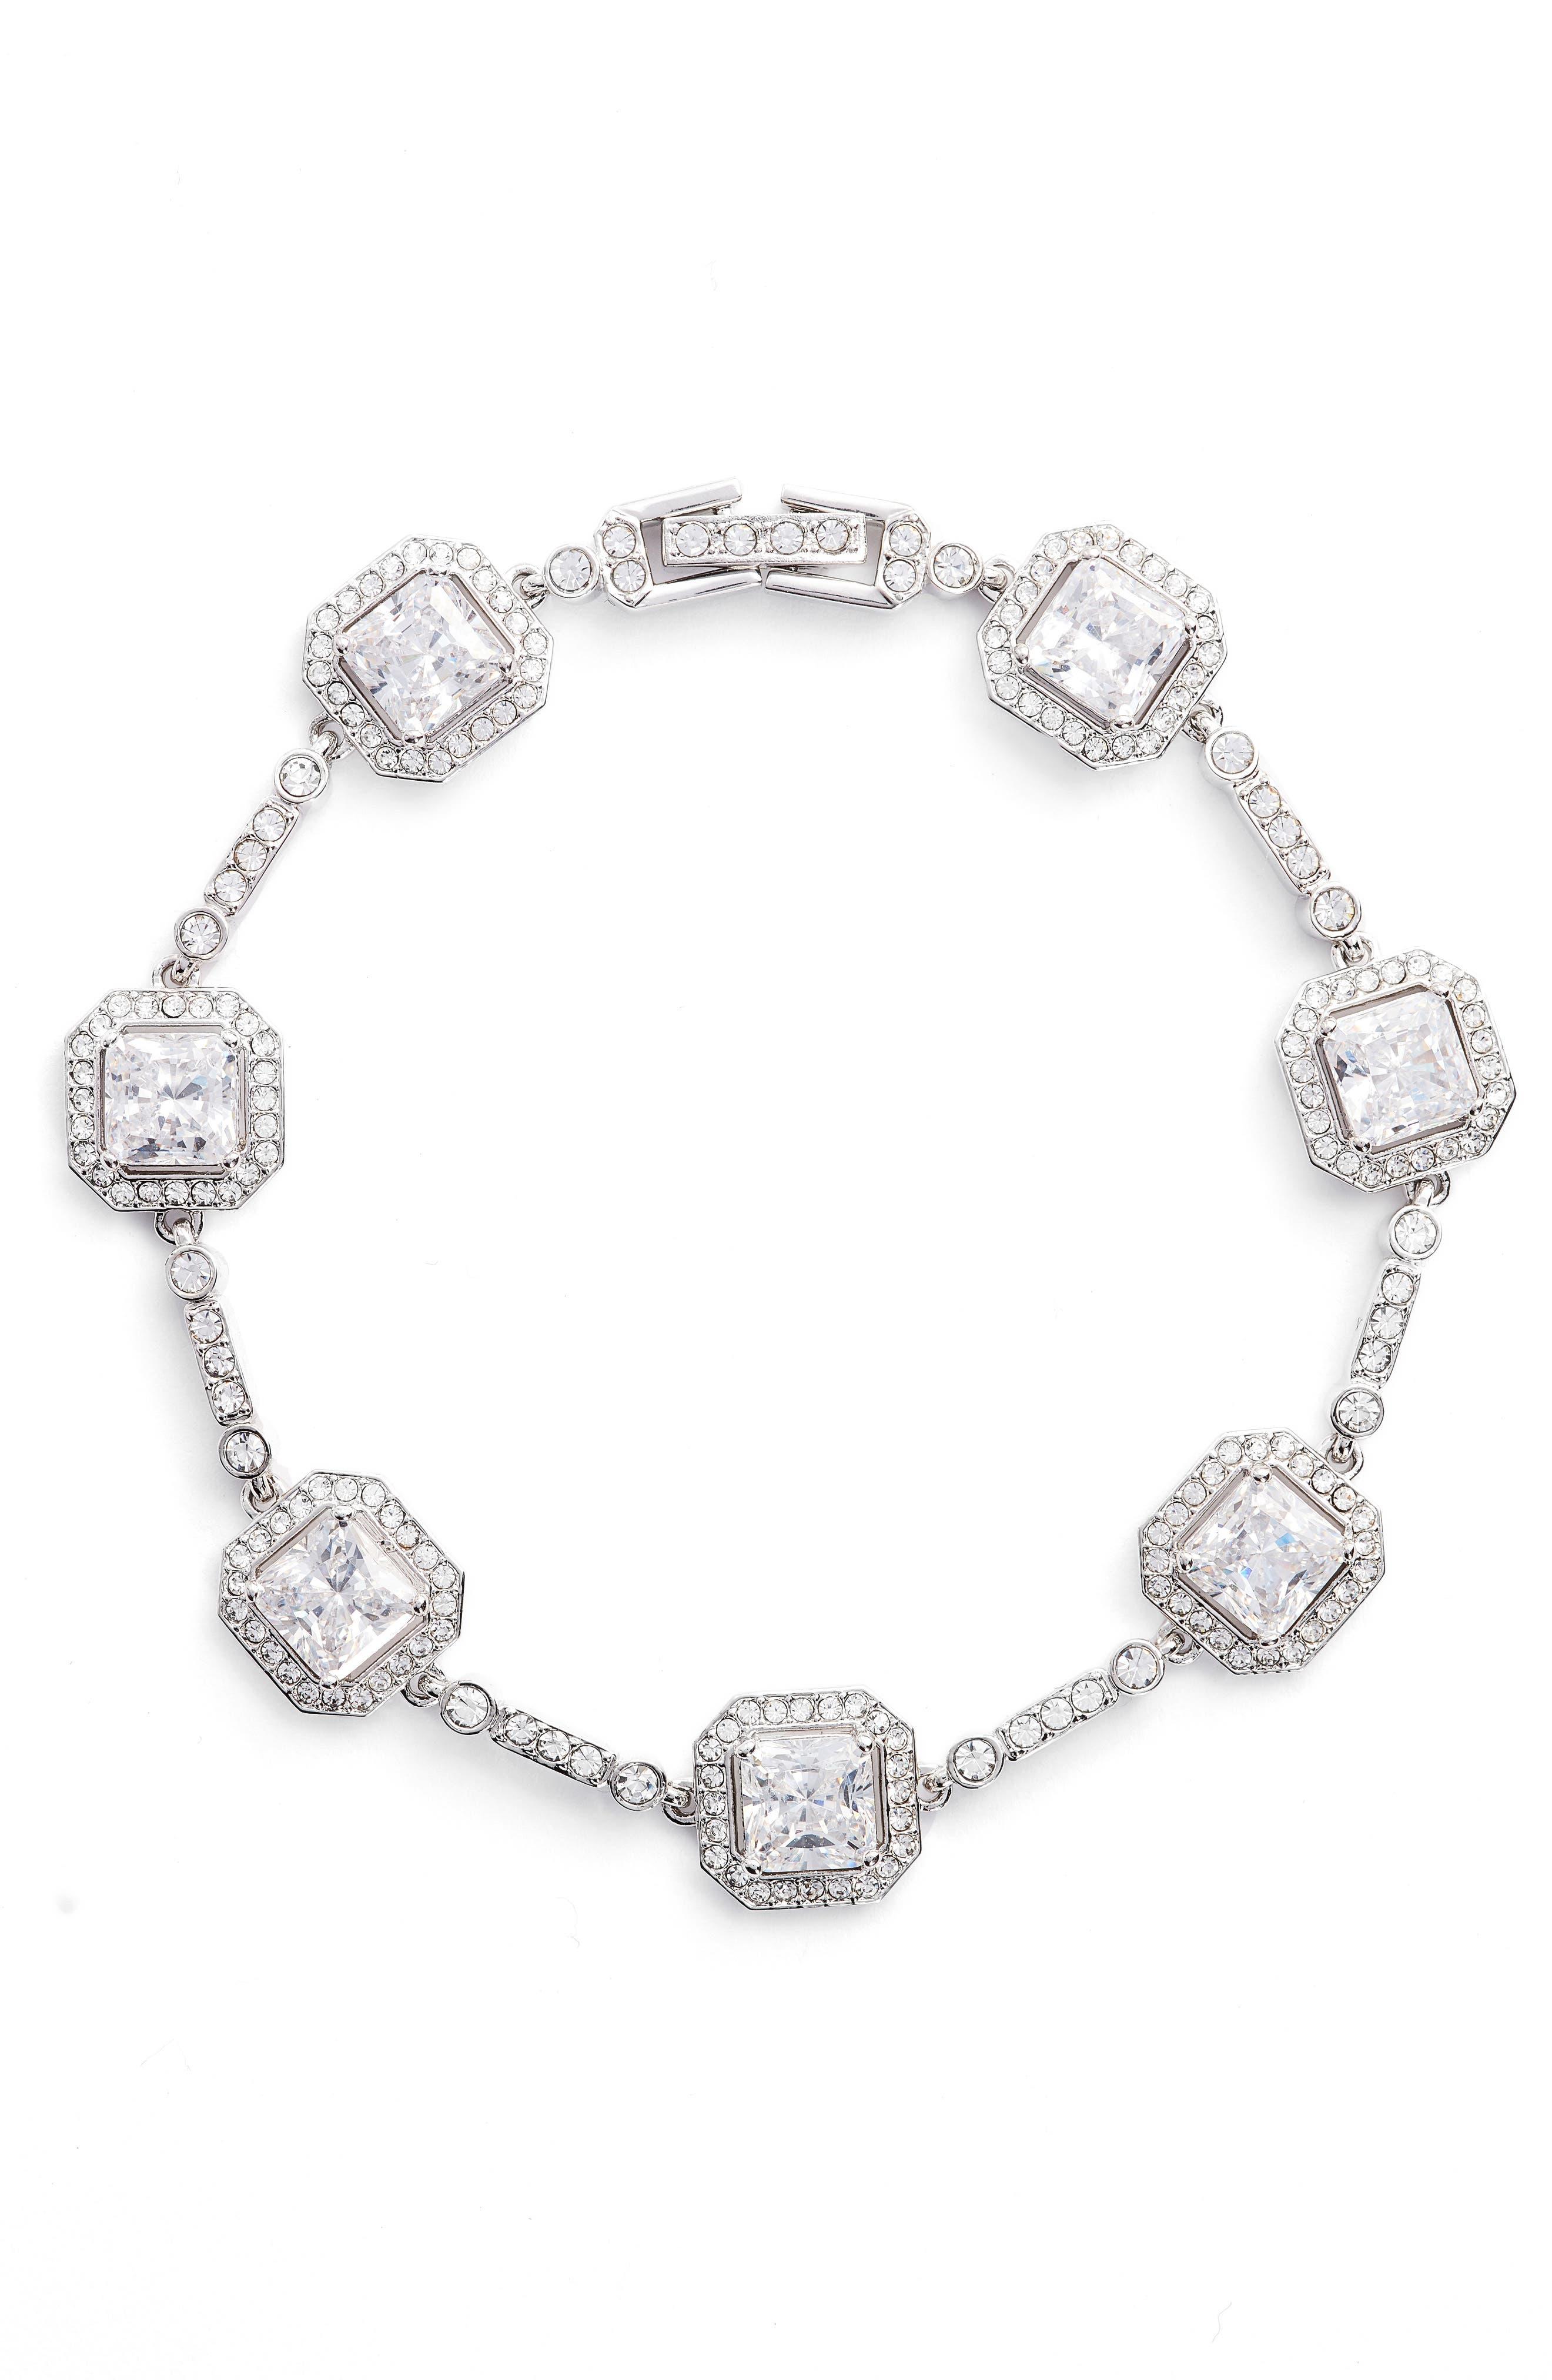 Main Image - Nadri Cubic Zirconia Bracelet